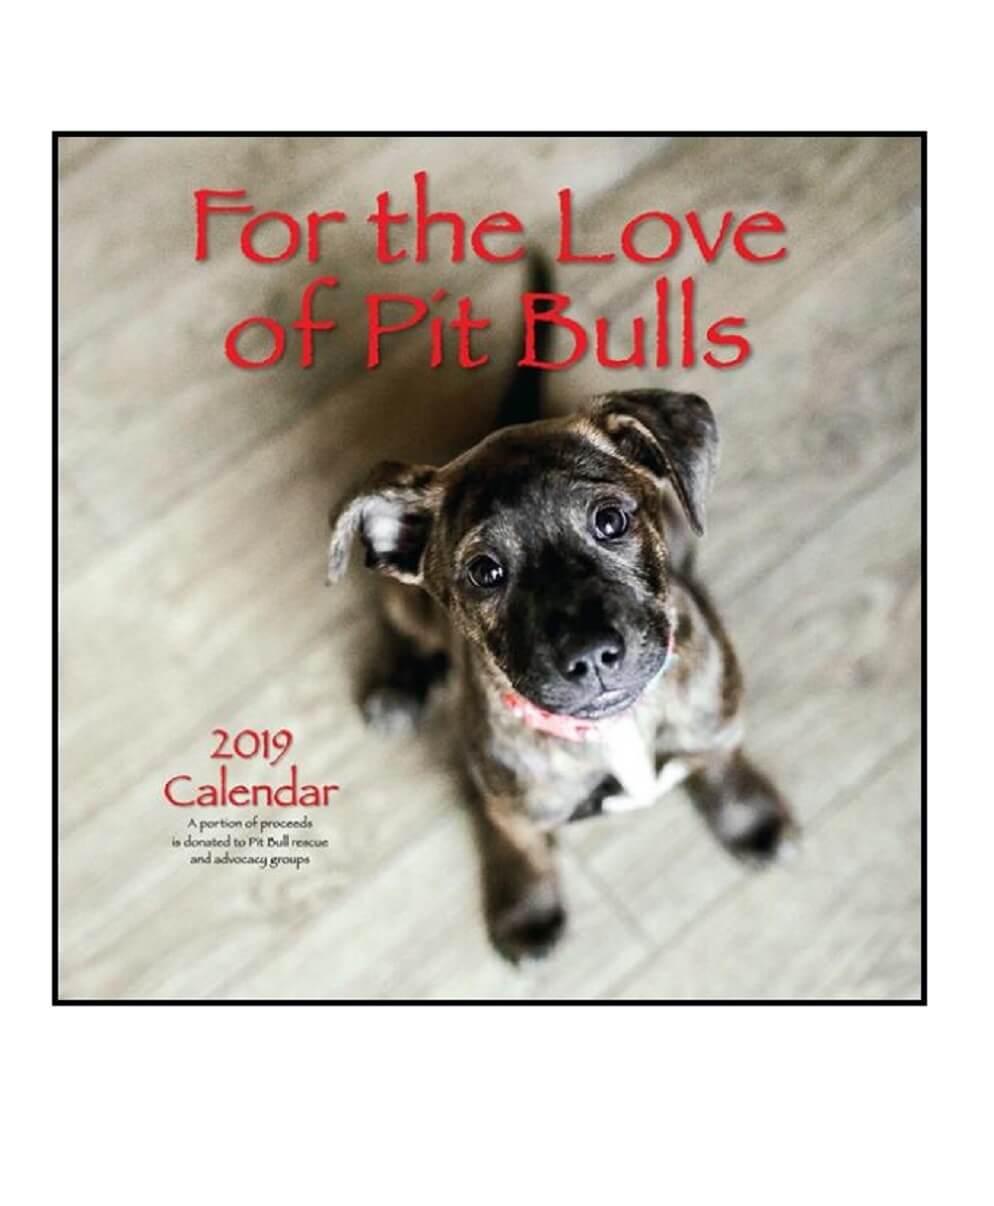 2019 For the Love of Pit Bulls Calendar